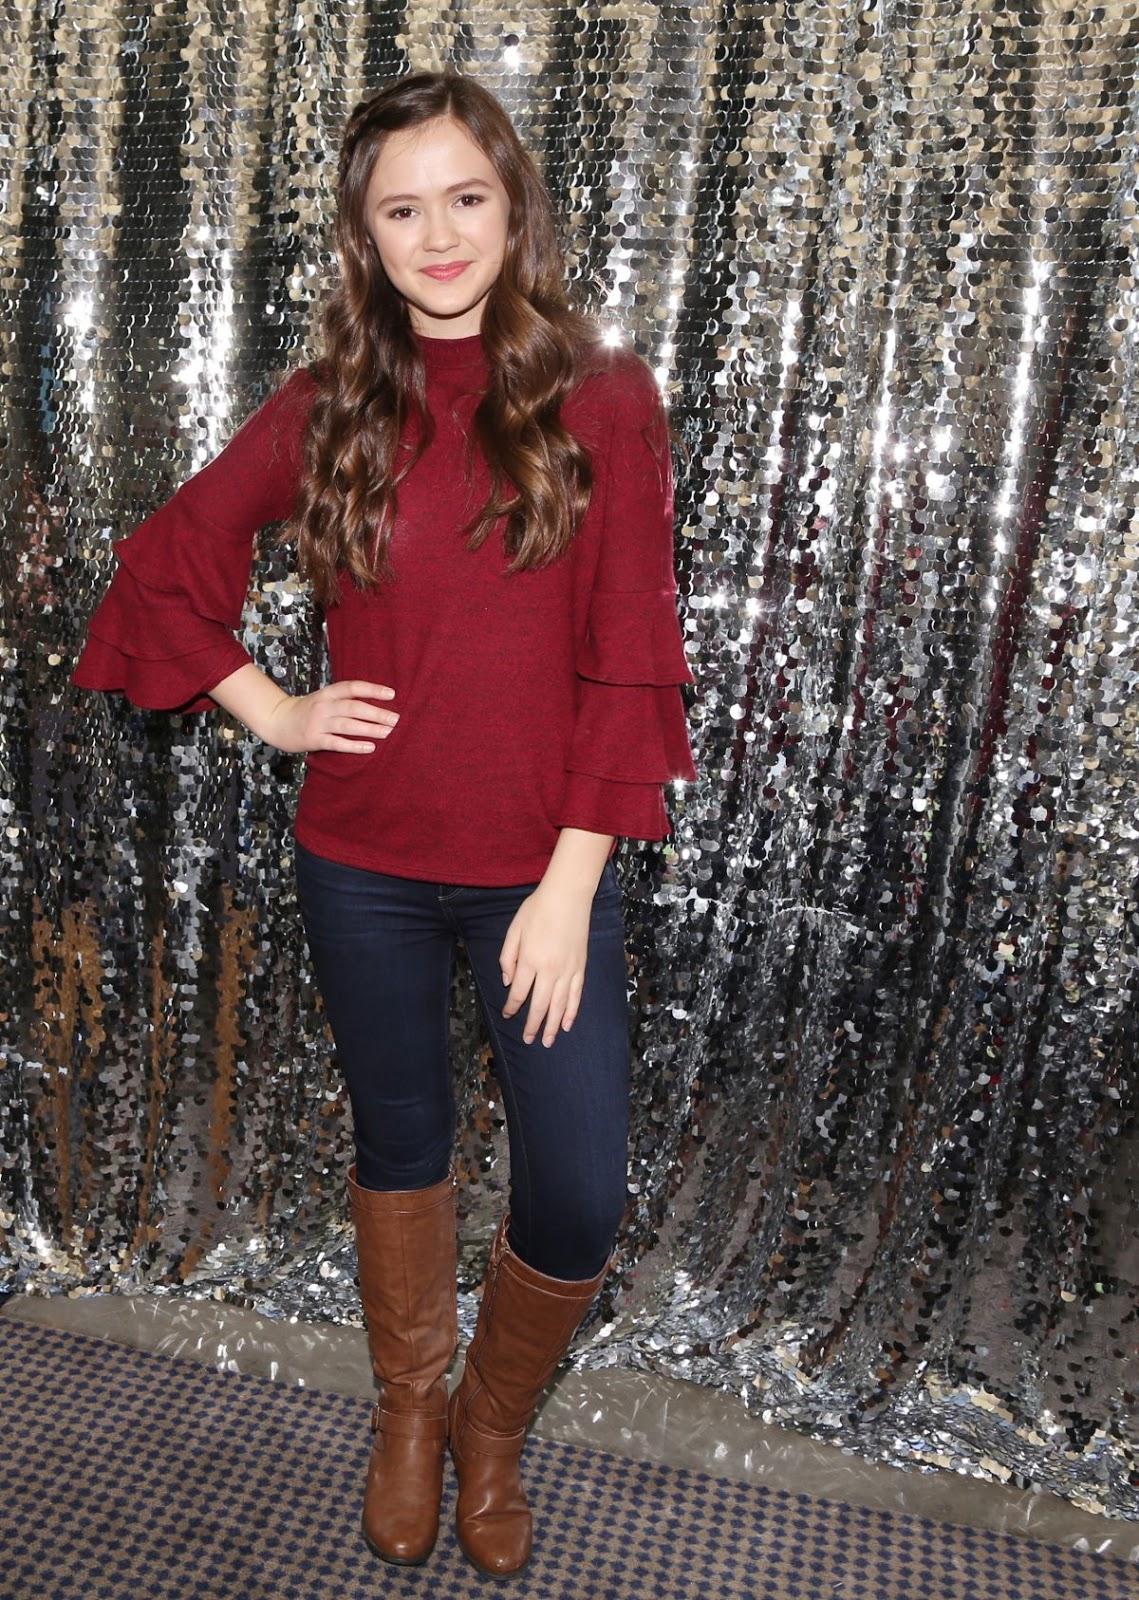 Starlet Arcade Olivia Sanabia